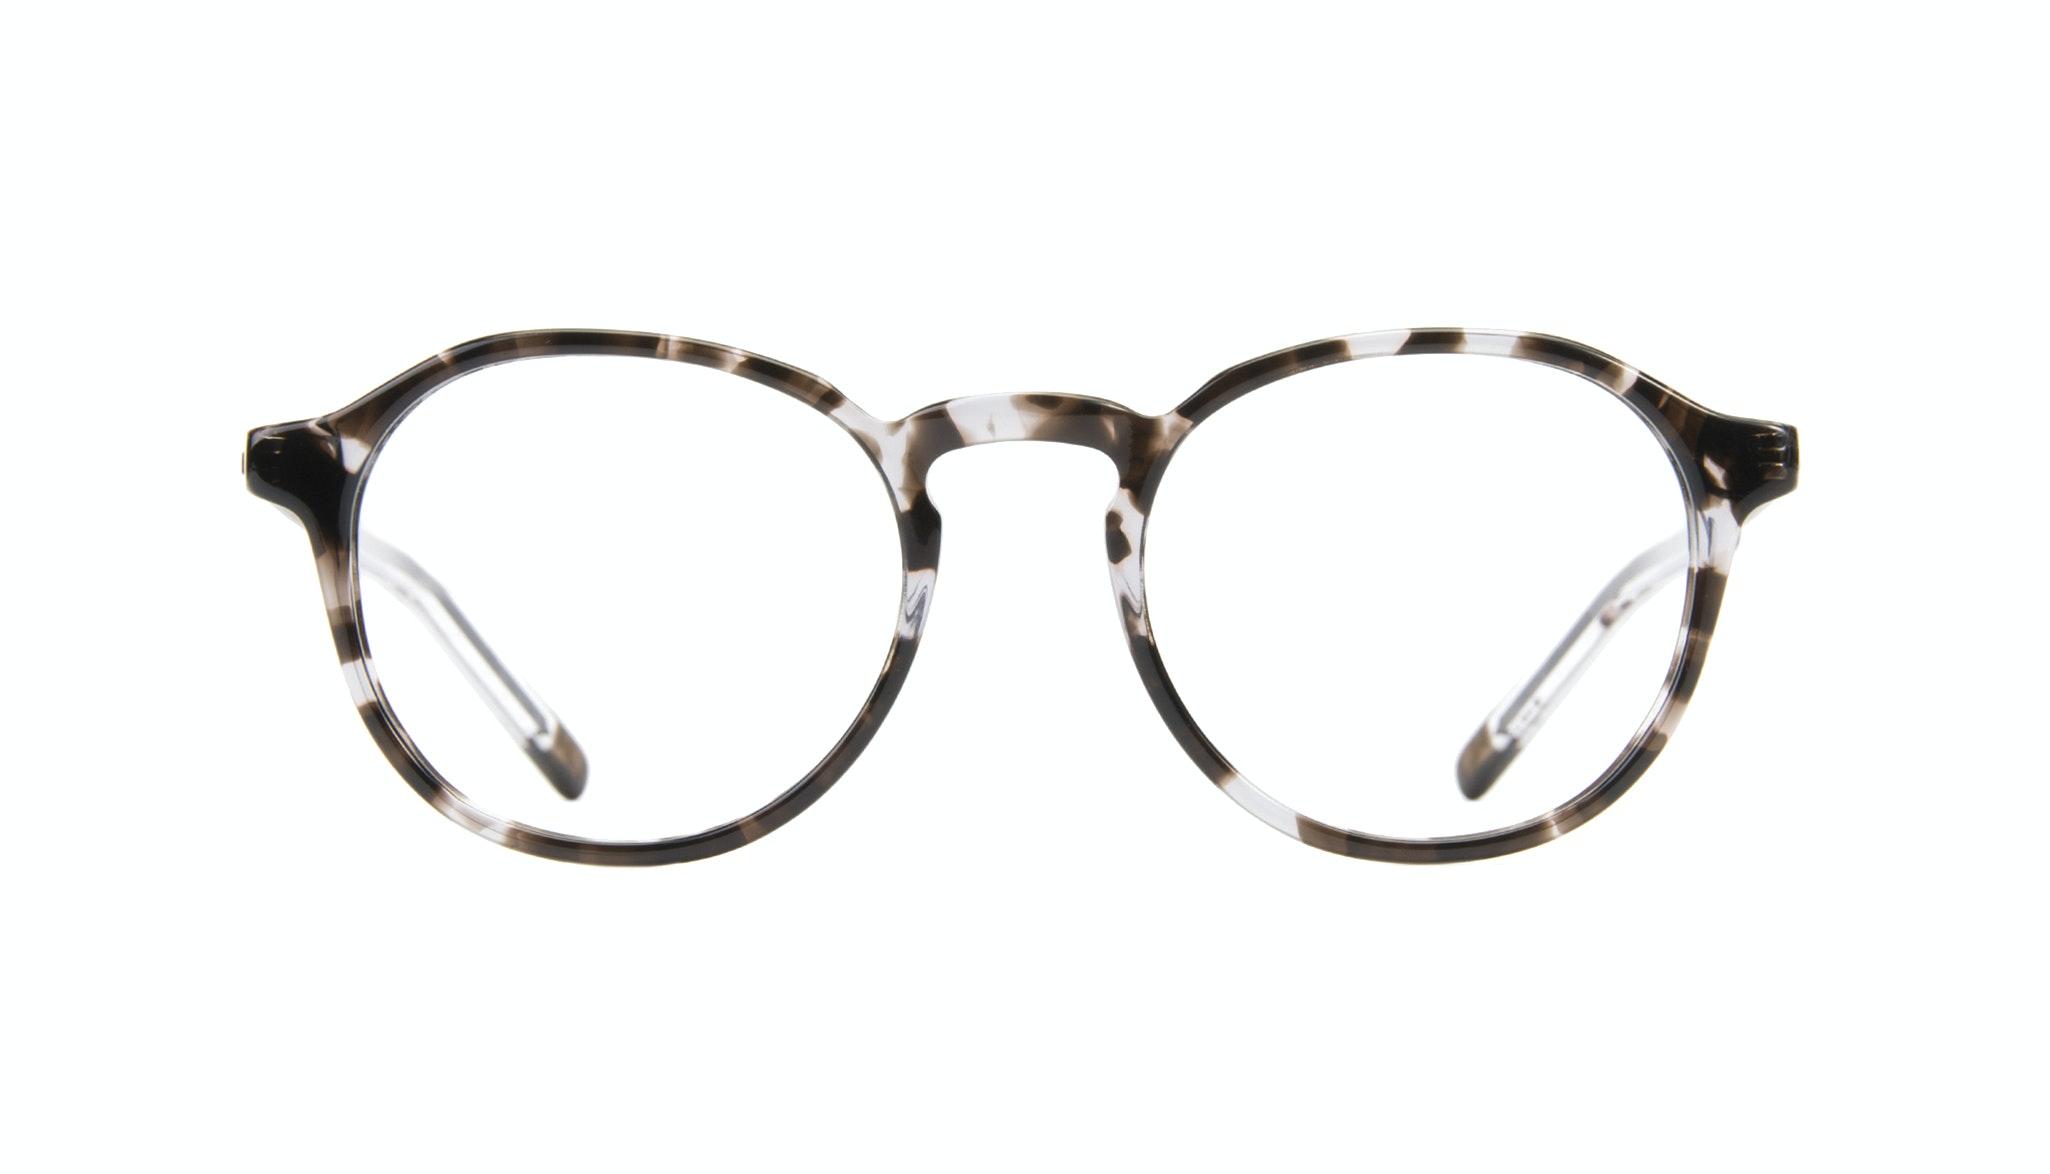 Affordable Fashion Glasses Round Eyeglasses Men Prime Mud Tort